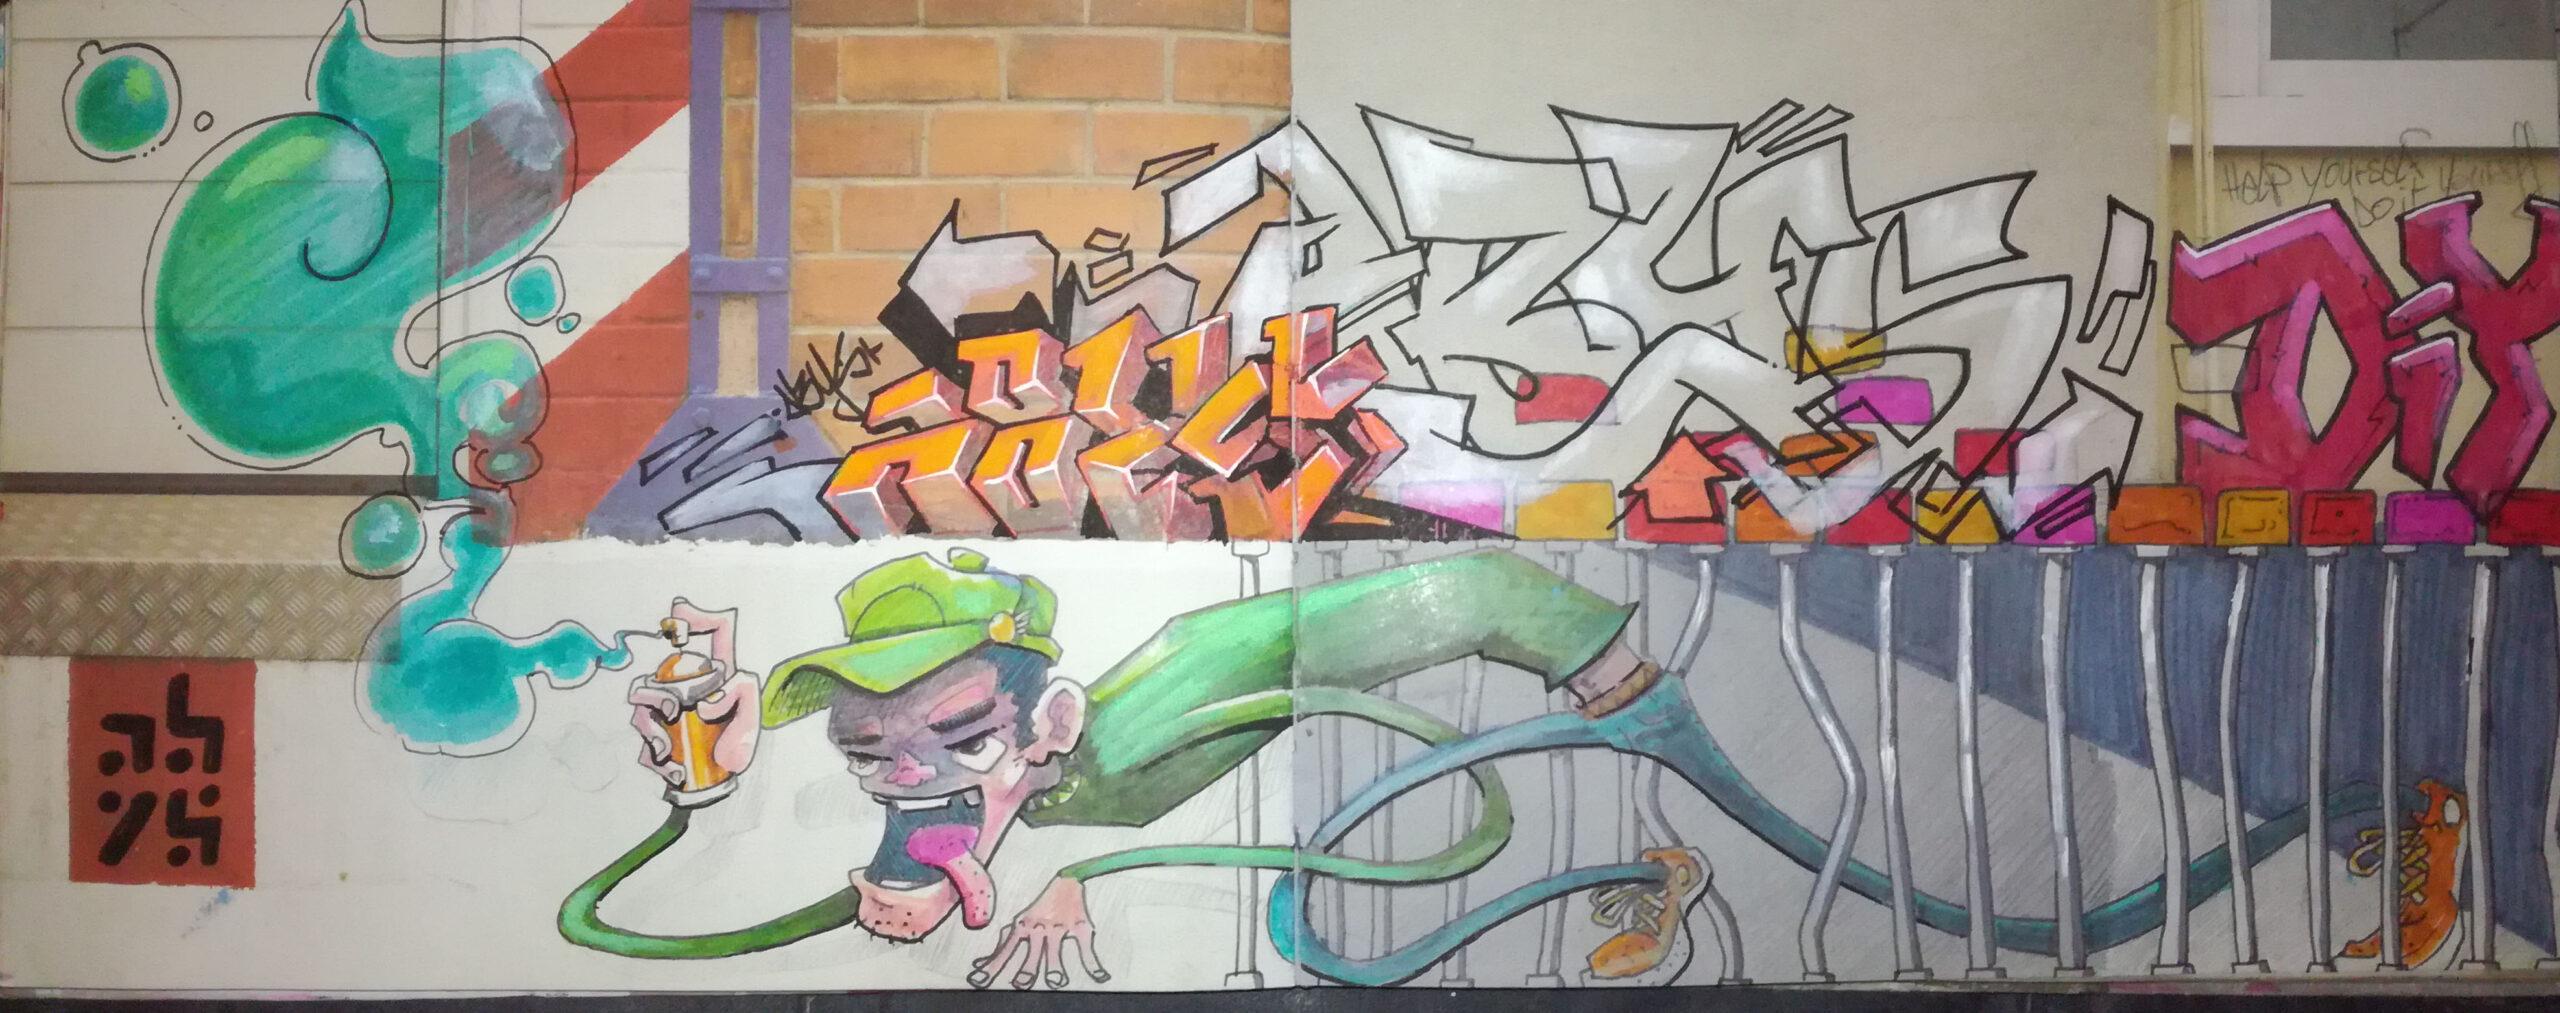 sketchbook - graffiti art - illustration - abys 2 fly - escape